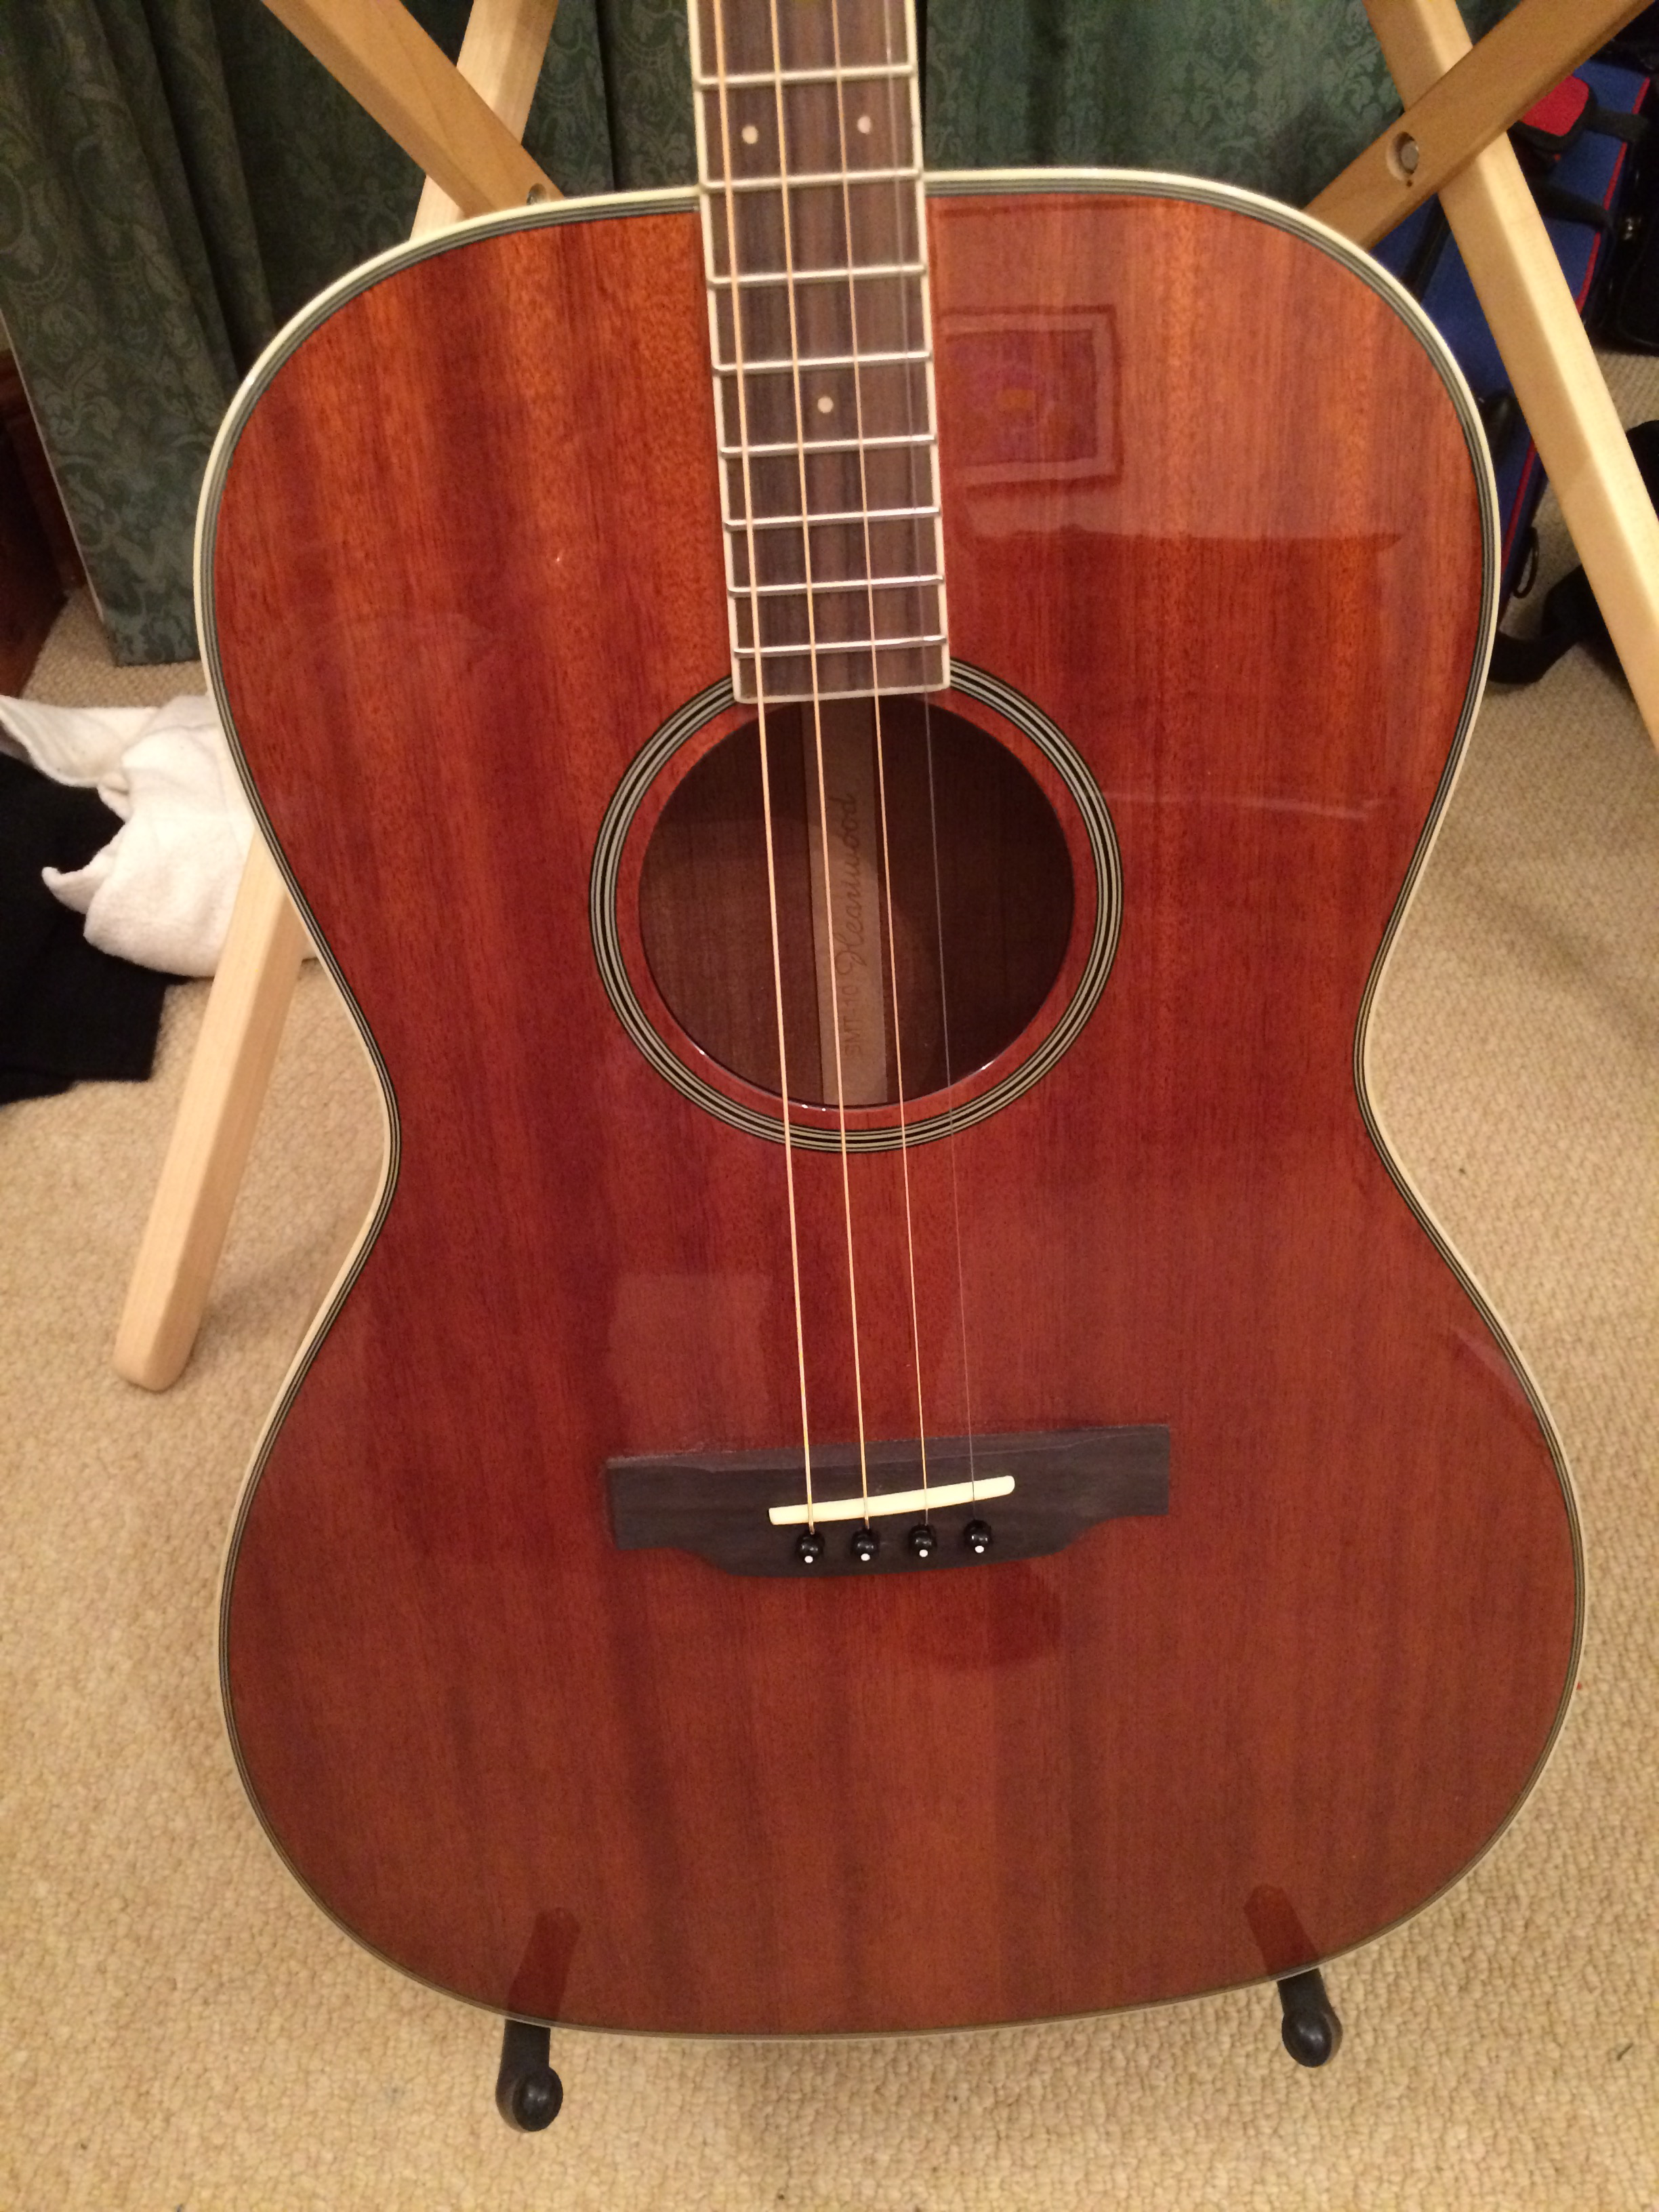 New Heartwood Smt 10 Tenor Guitar